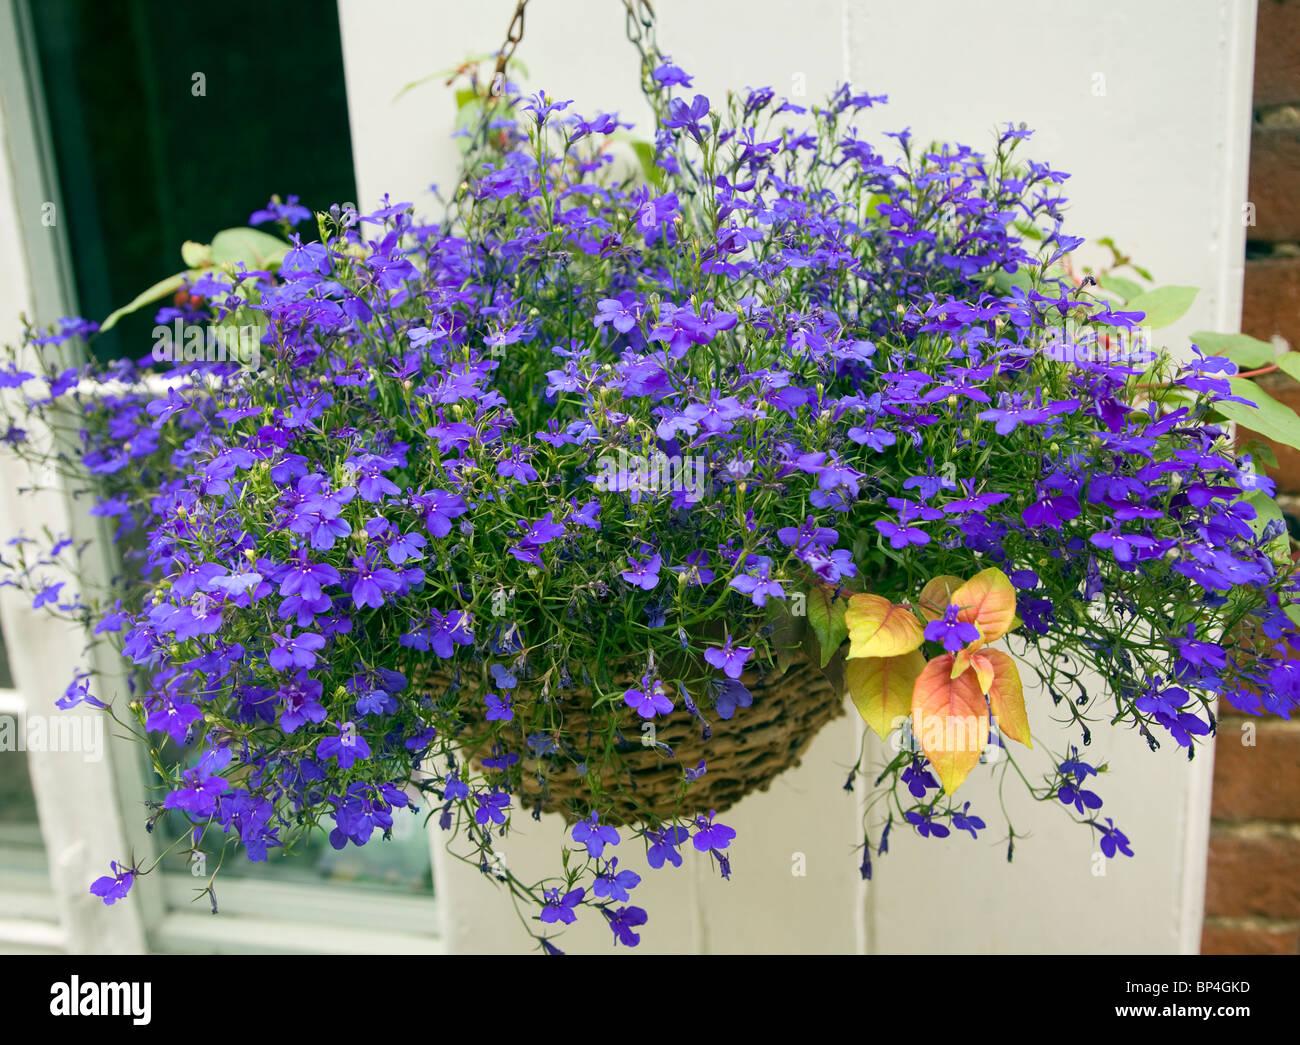 Hanging Basket Blue Lobelia Flowering Plant Stock Photo 30833697